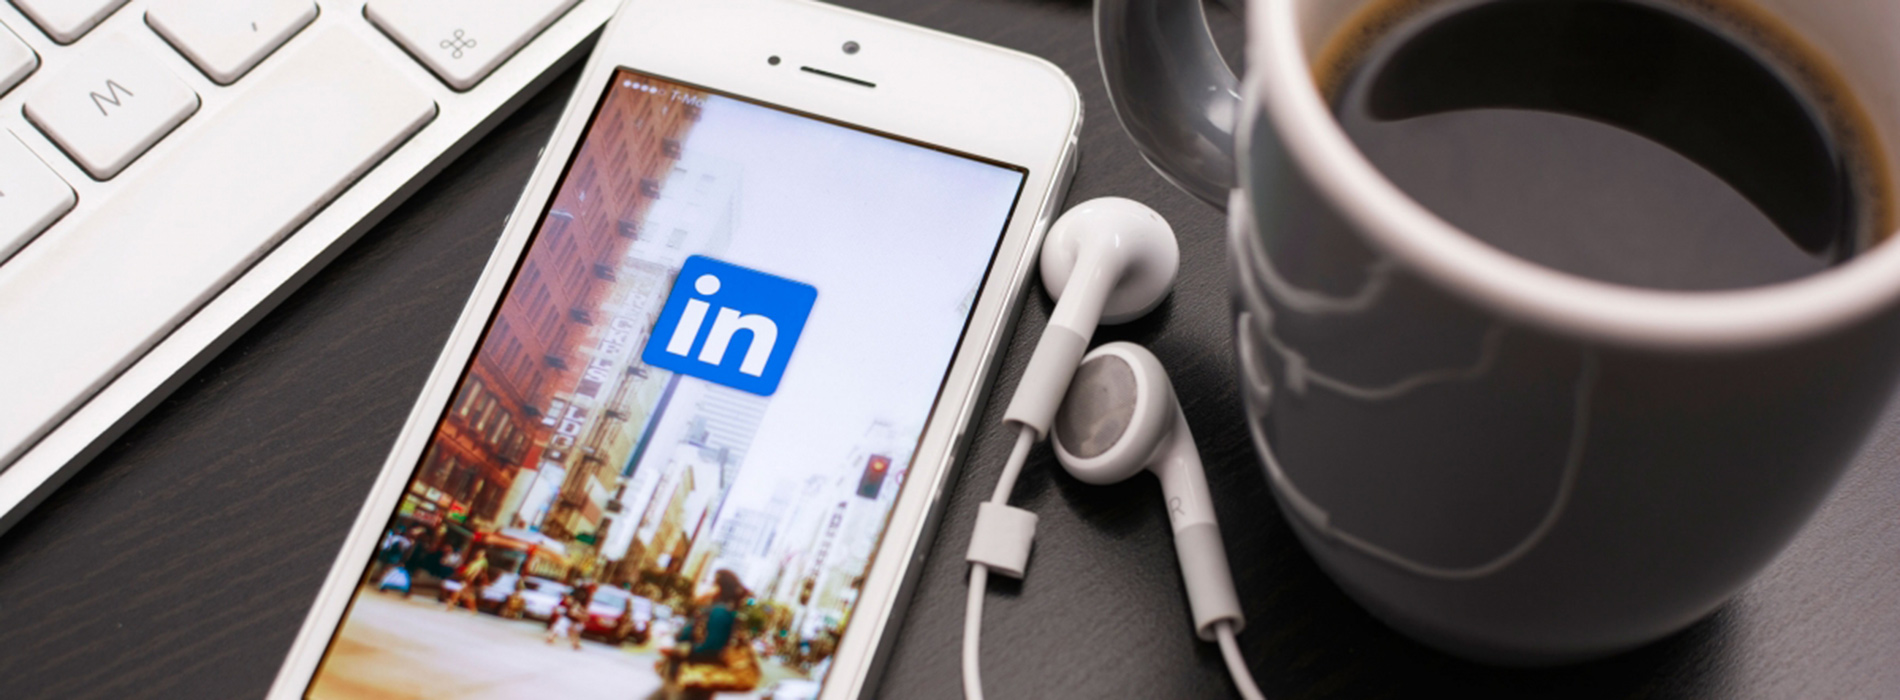 LinkedIn on a mobile phone